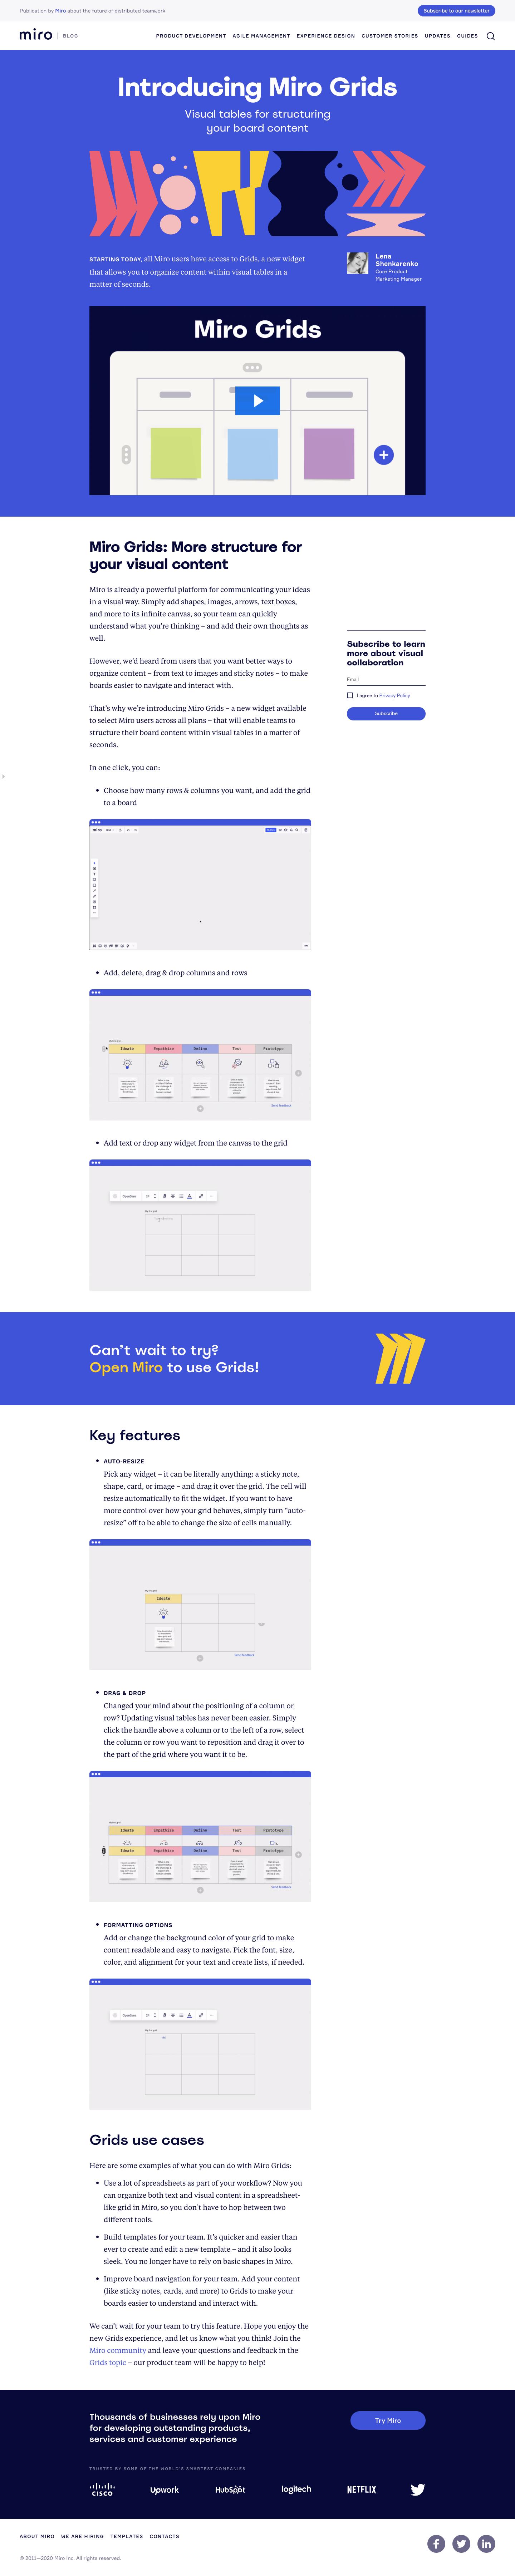 Miro Product Updates